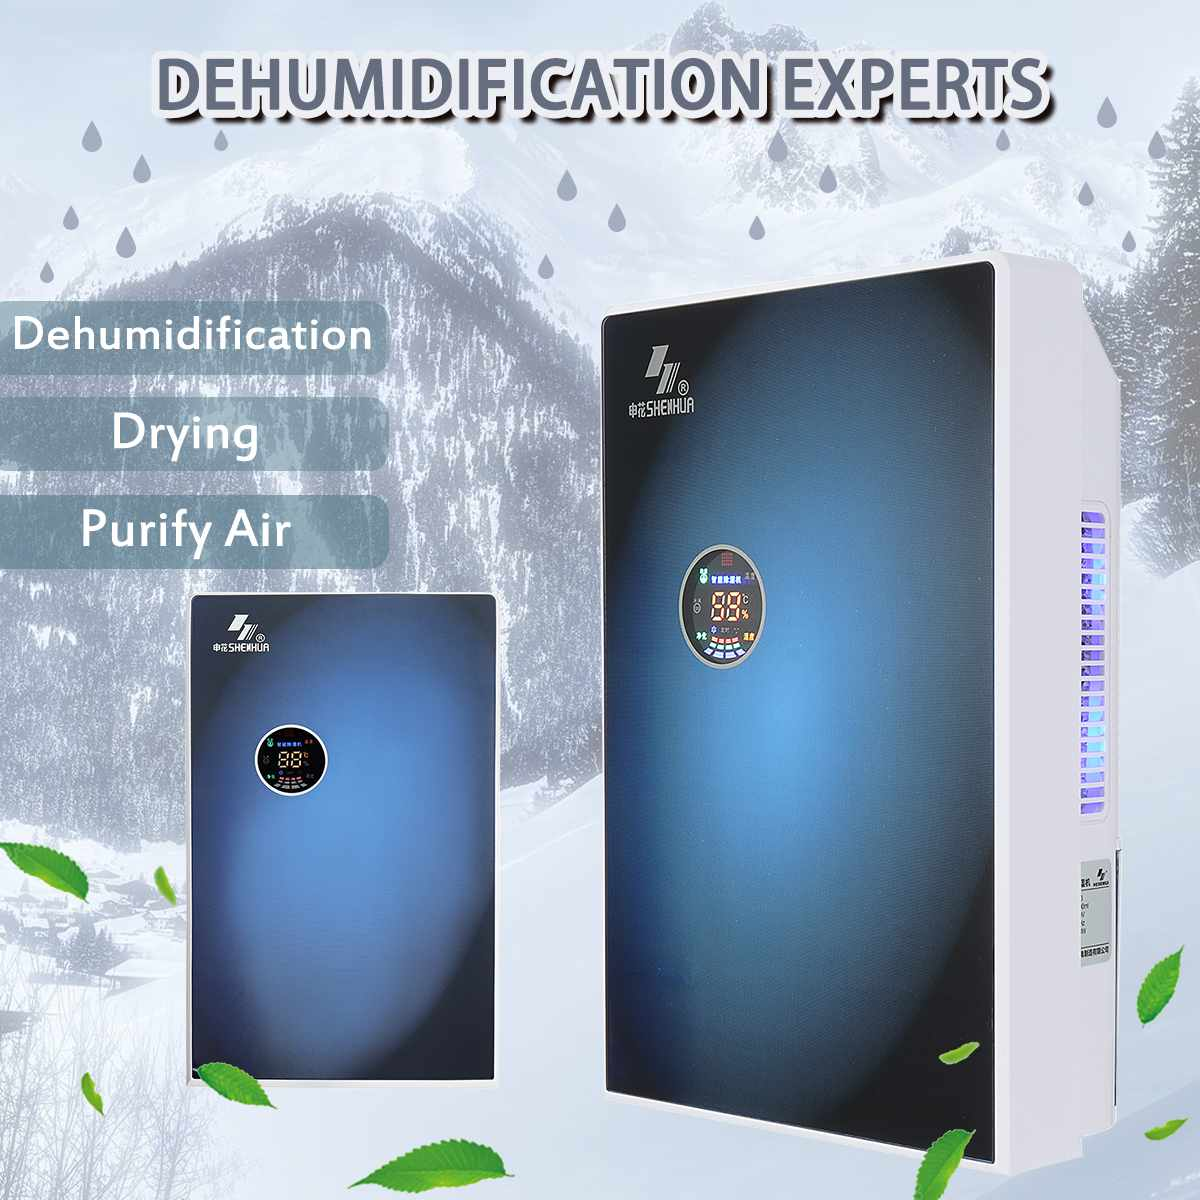 Dehumidifier Moisture Absorber Anion Purify Air Dryer Portable Home Mute Dehumidifier Drying Machine Household Purification